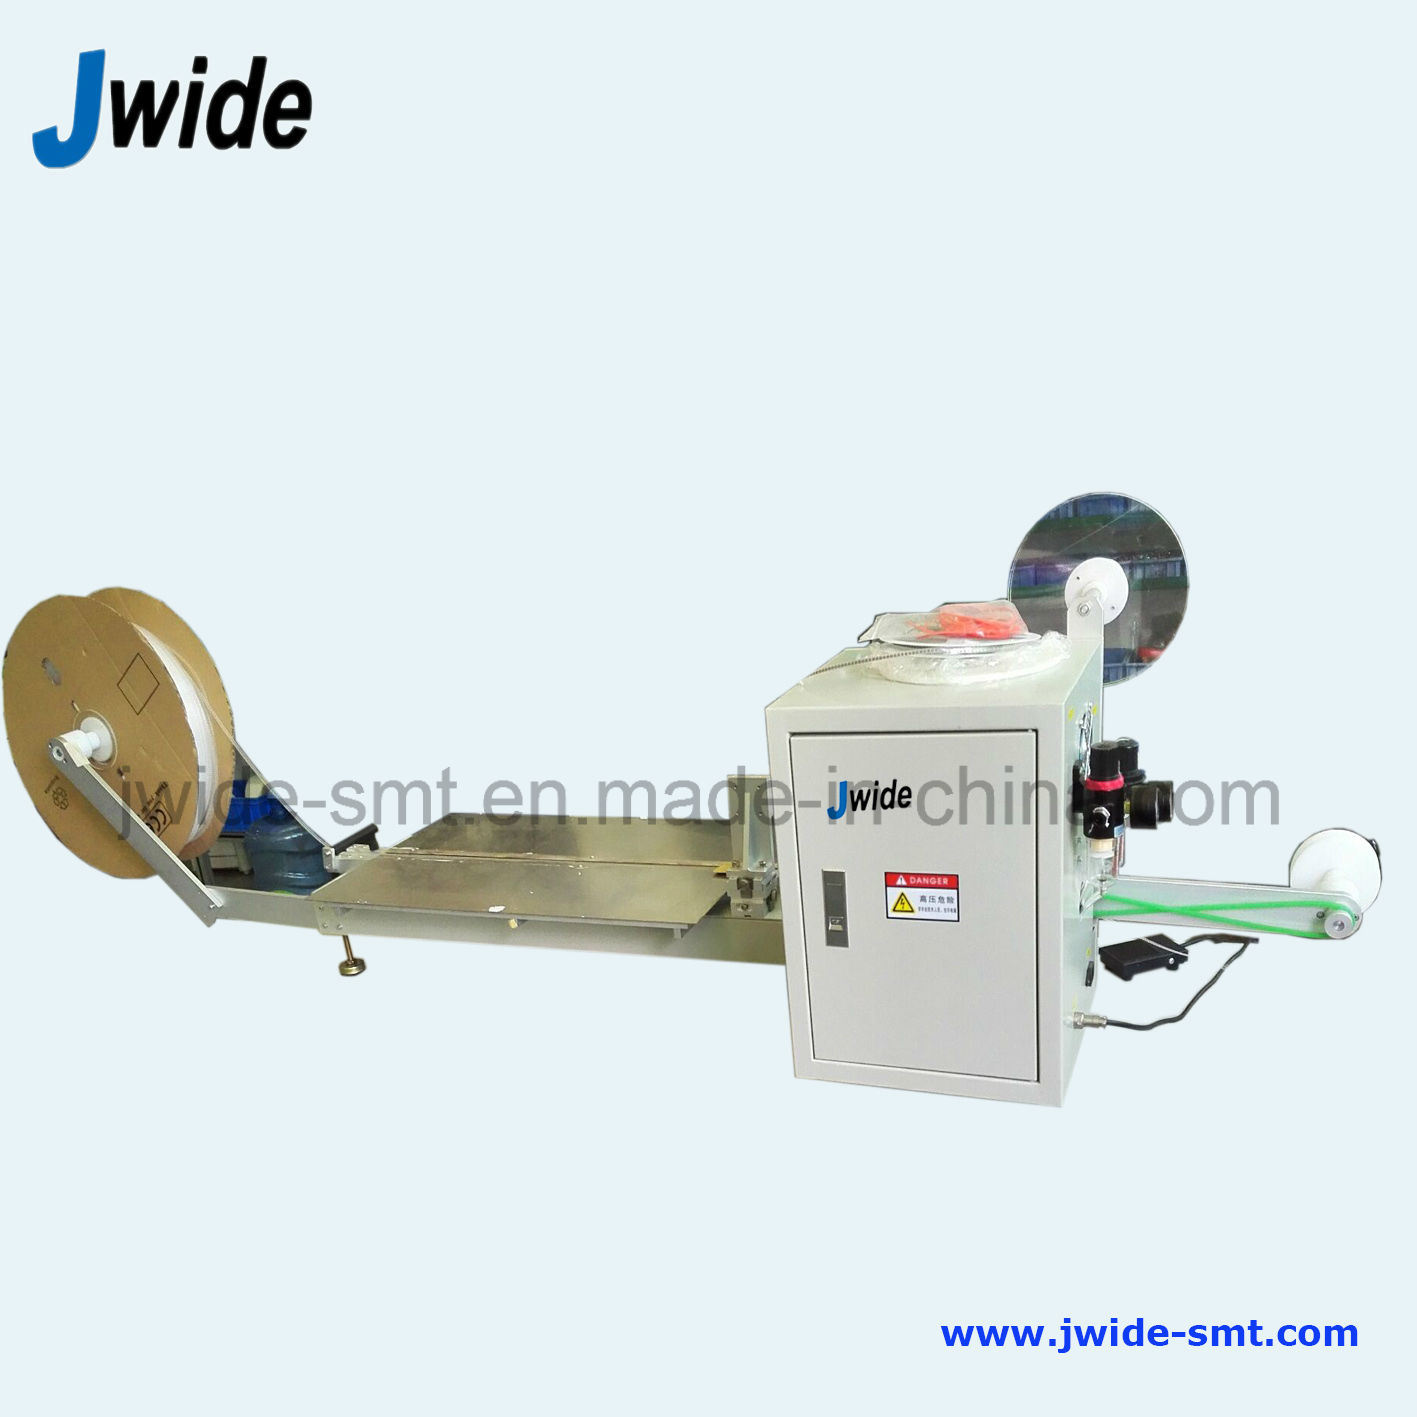 Semi Automatic Components Taping Machine